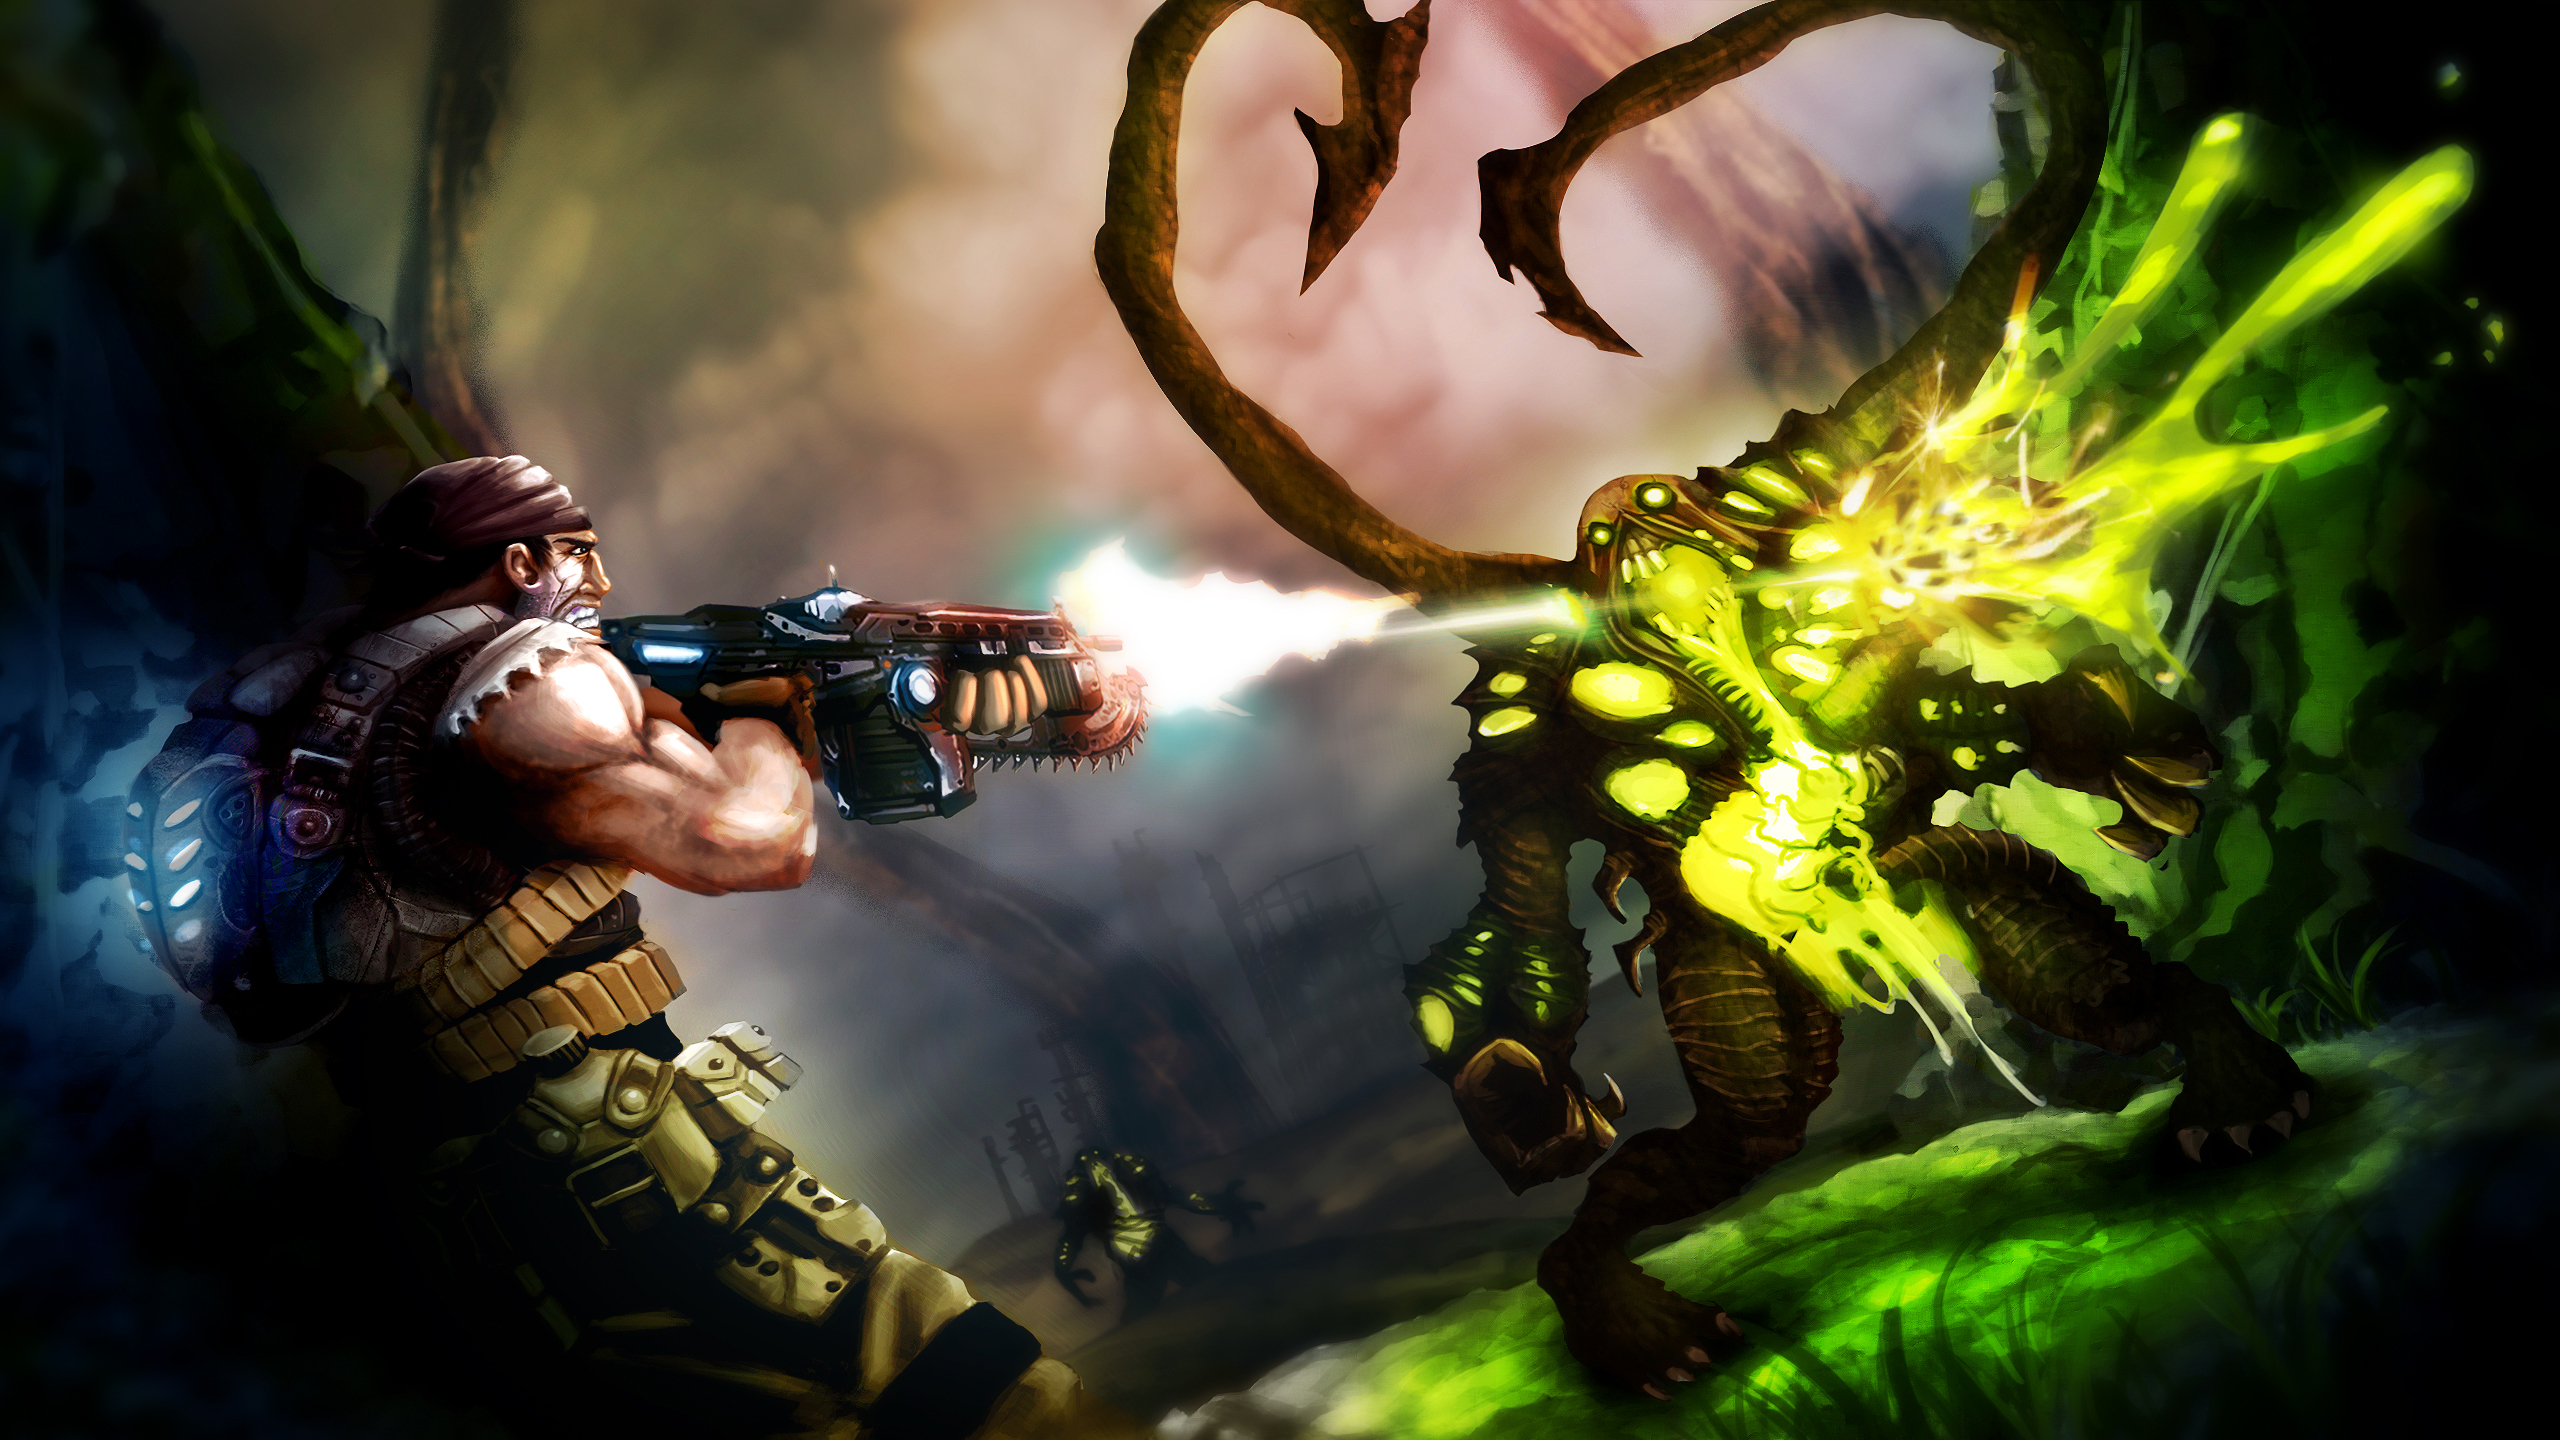 Gears of War 3 Entry by derekblairart